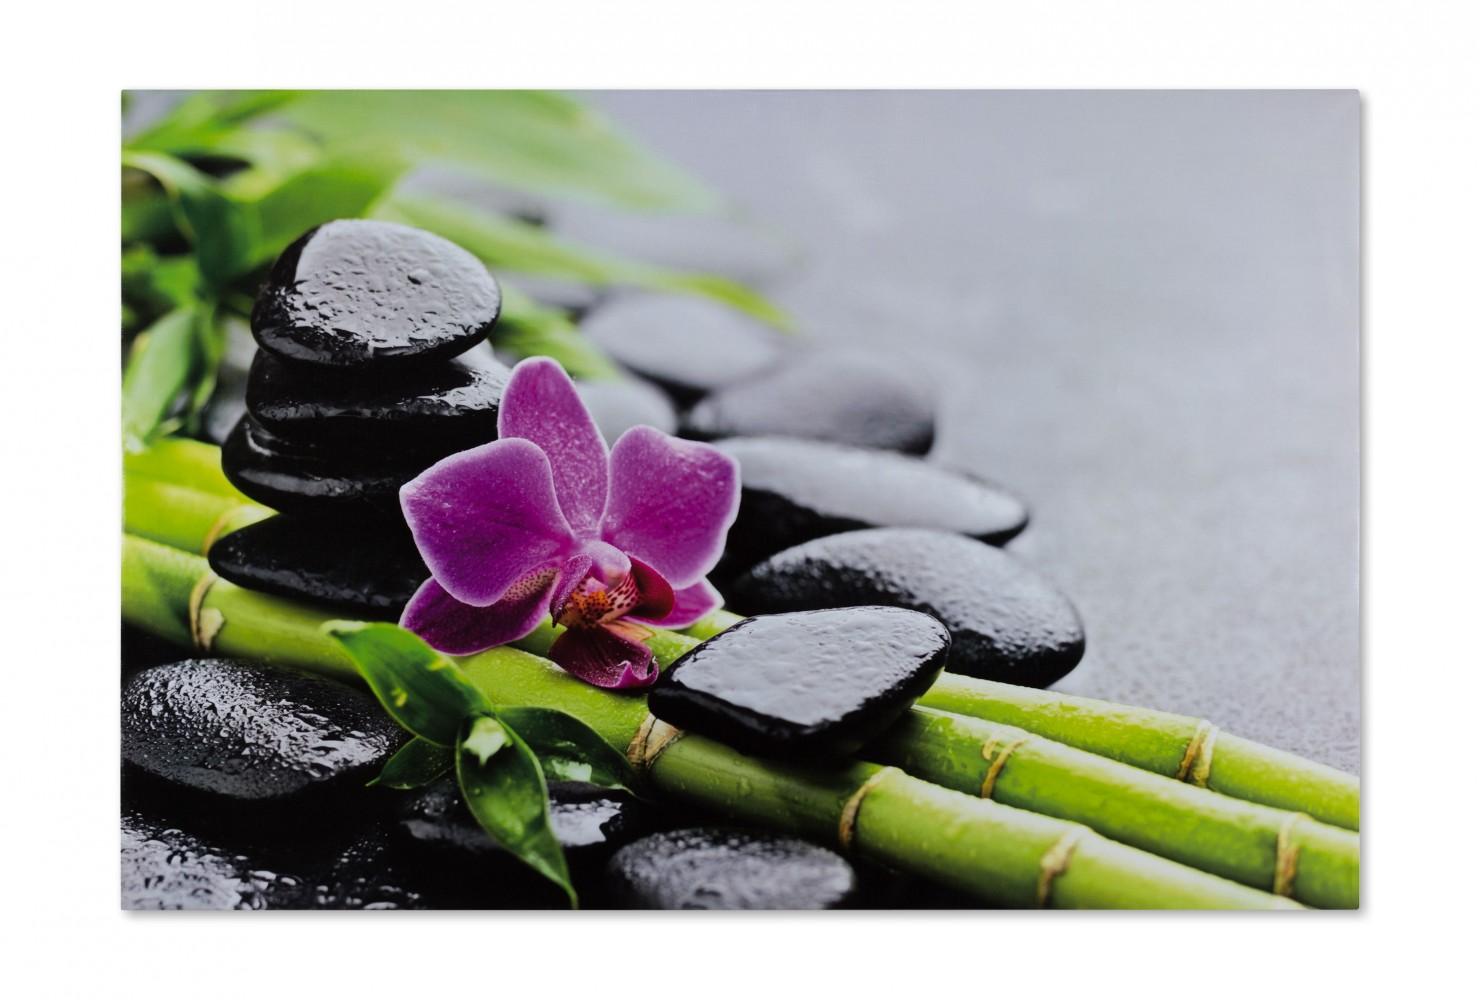 keilrahmen leinwand bild wandbild 60x90 wellness steine. Black Bedroom Furniture Sets. Home Design Ideas